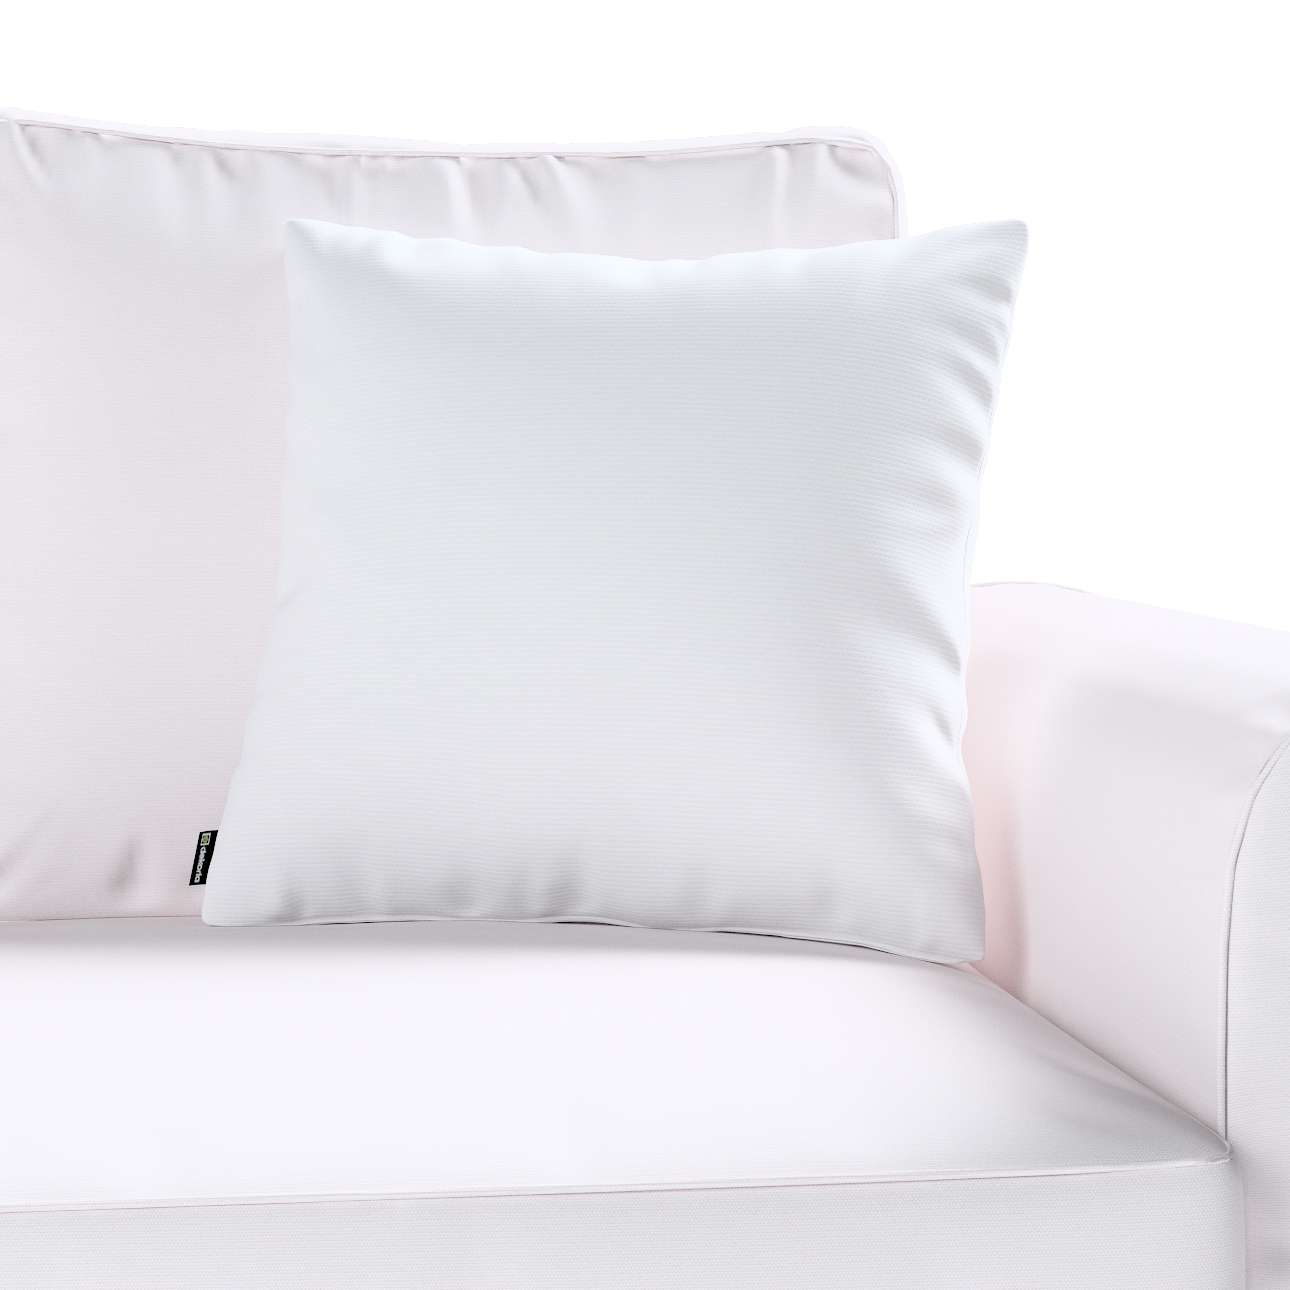 Poszewka Kinga na poduszkę w kolekcji Jupiter, tkanina: 127-01